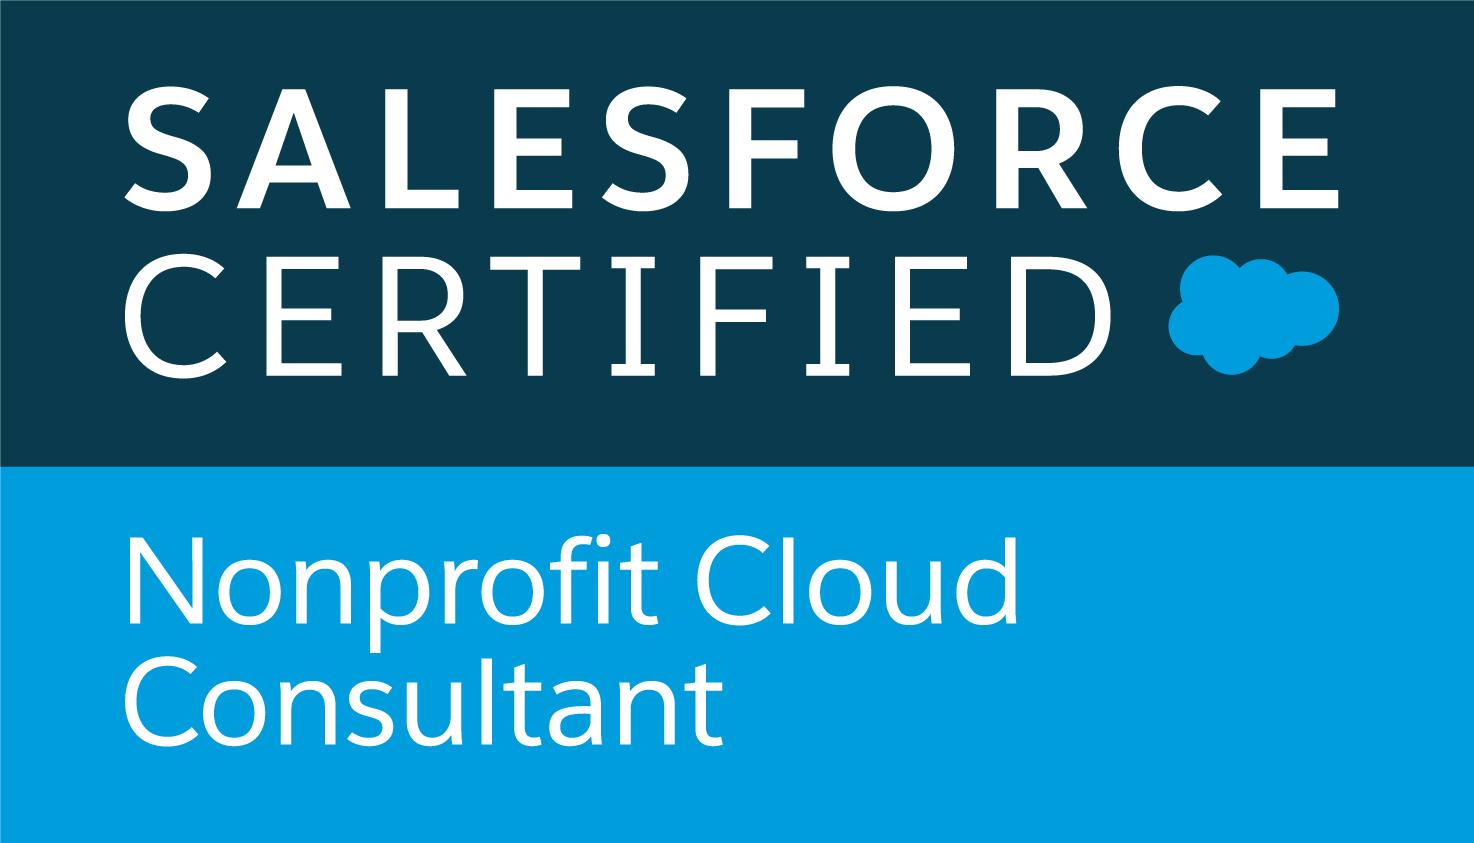 Nonprofit-Cloud-Consultant_CMYK.jpg